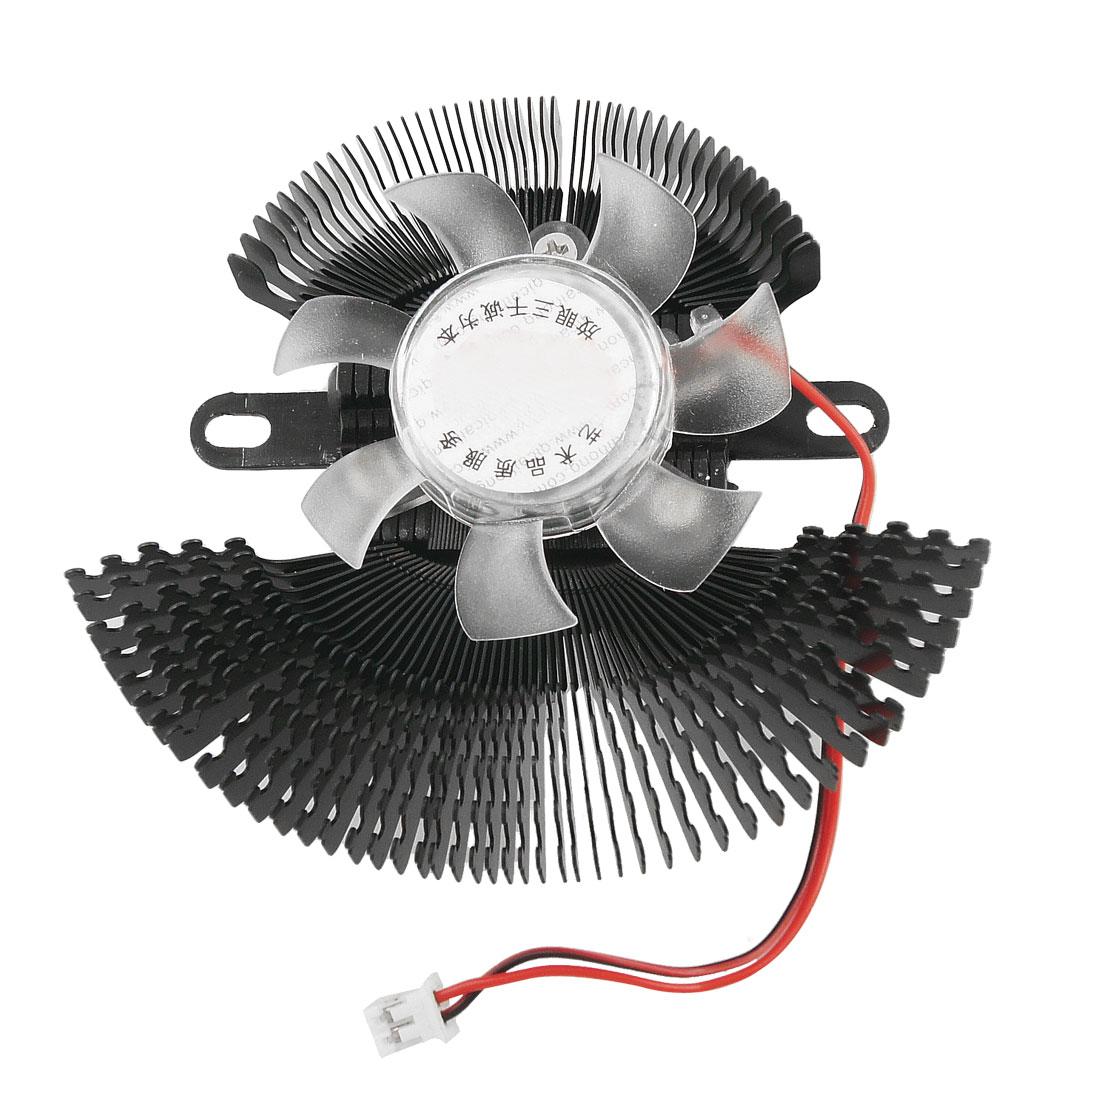 Black Heatsink Clear DC 12V 2 Terminals Computer VGA Cooler Cooling Fan